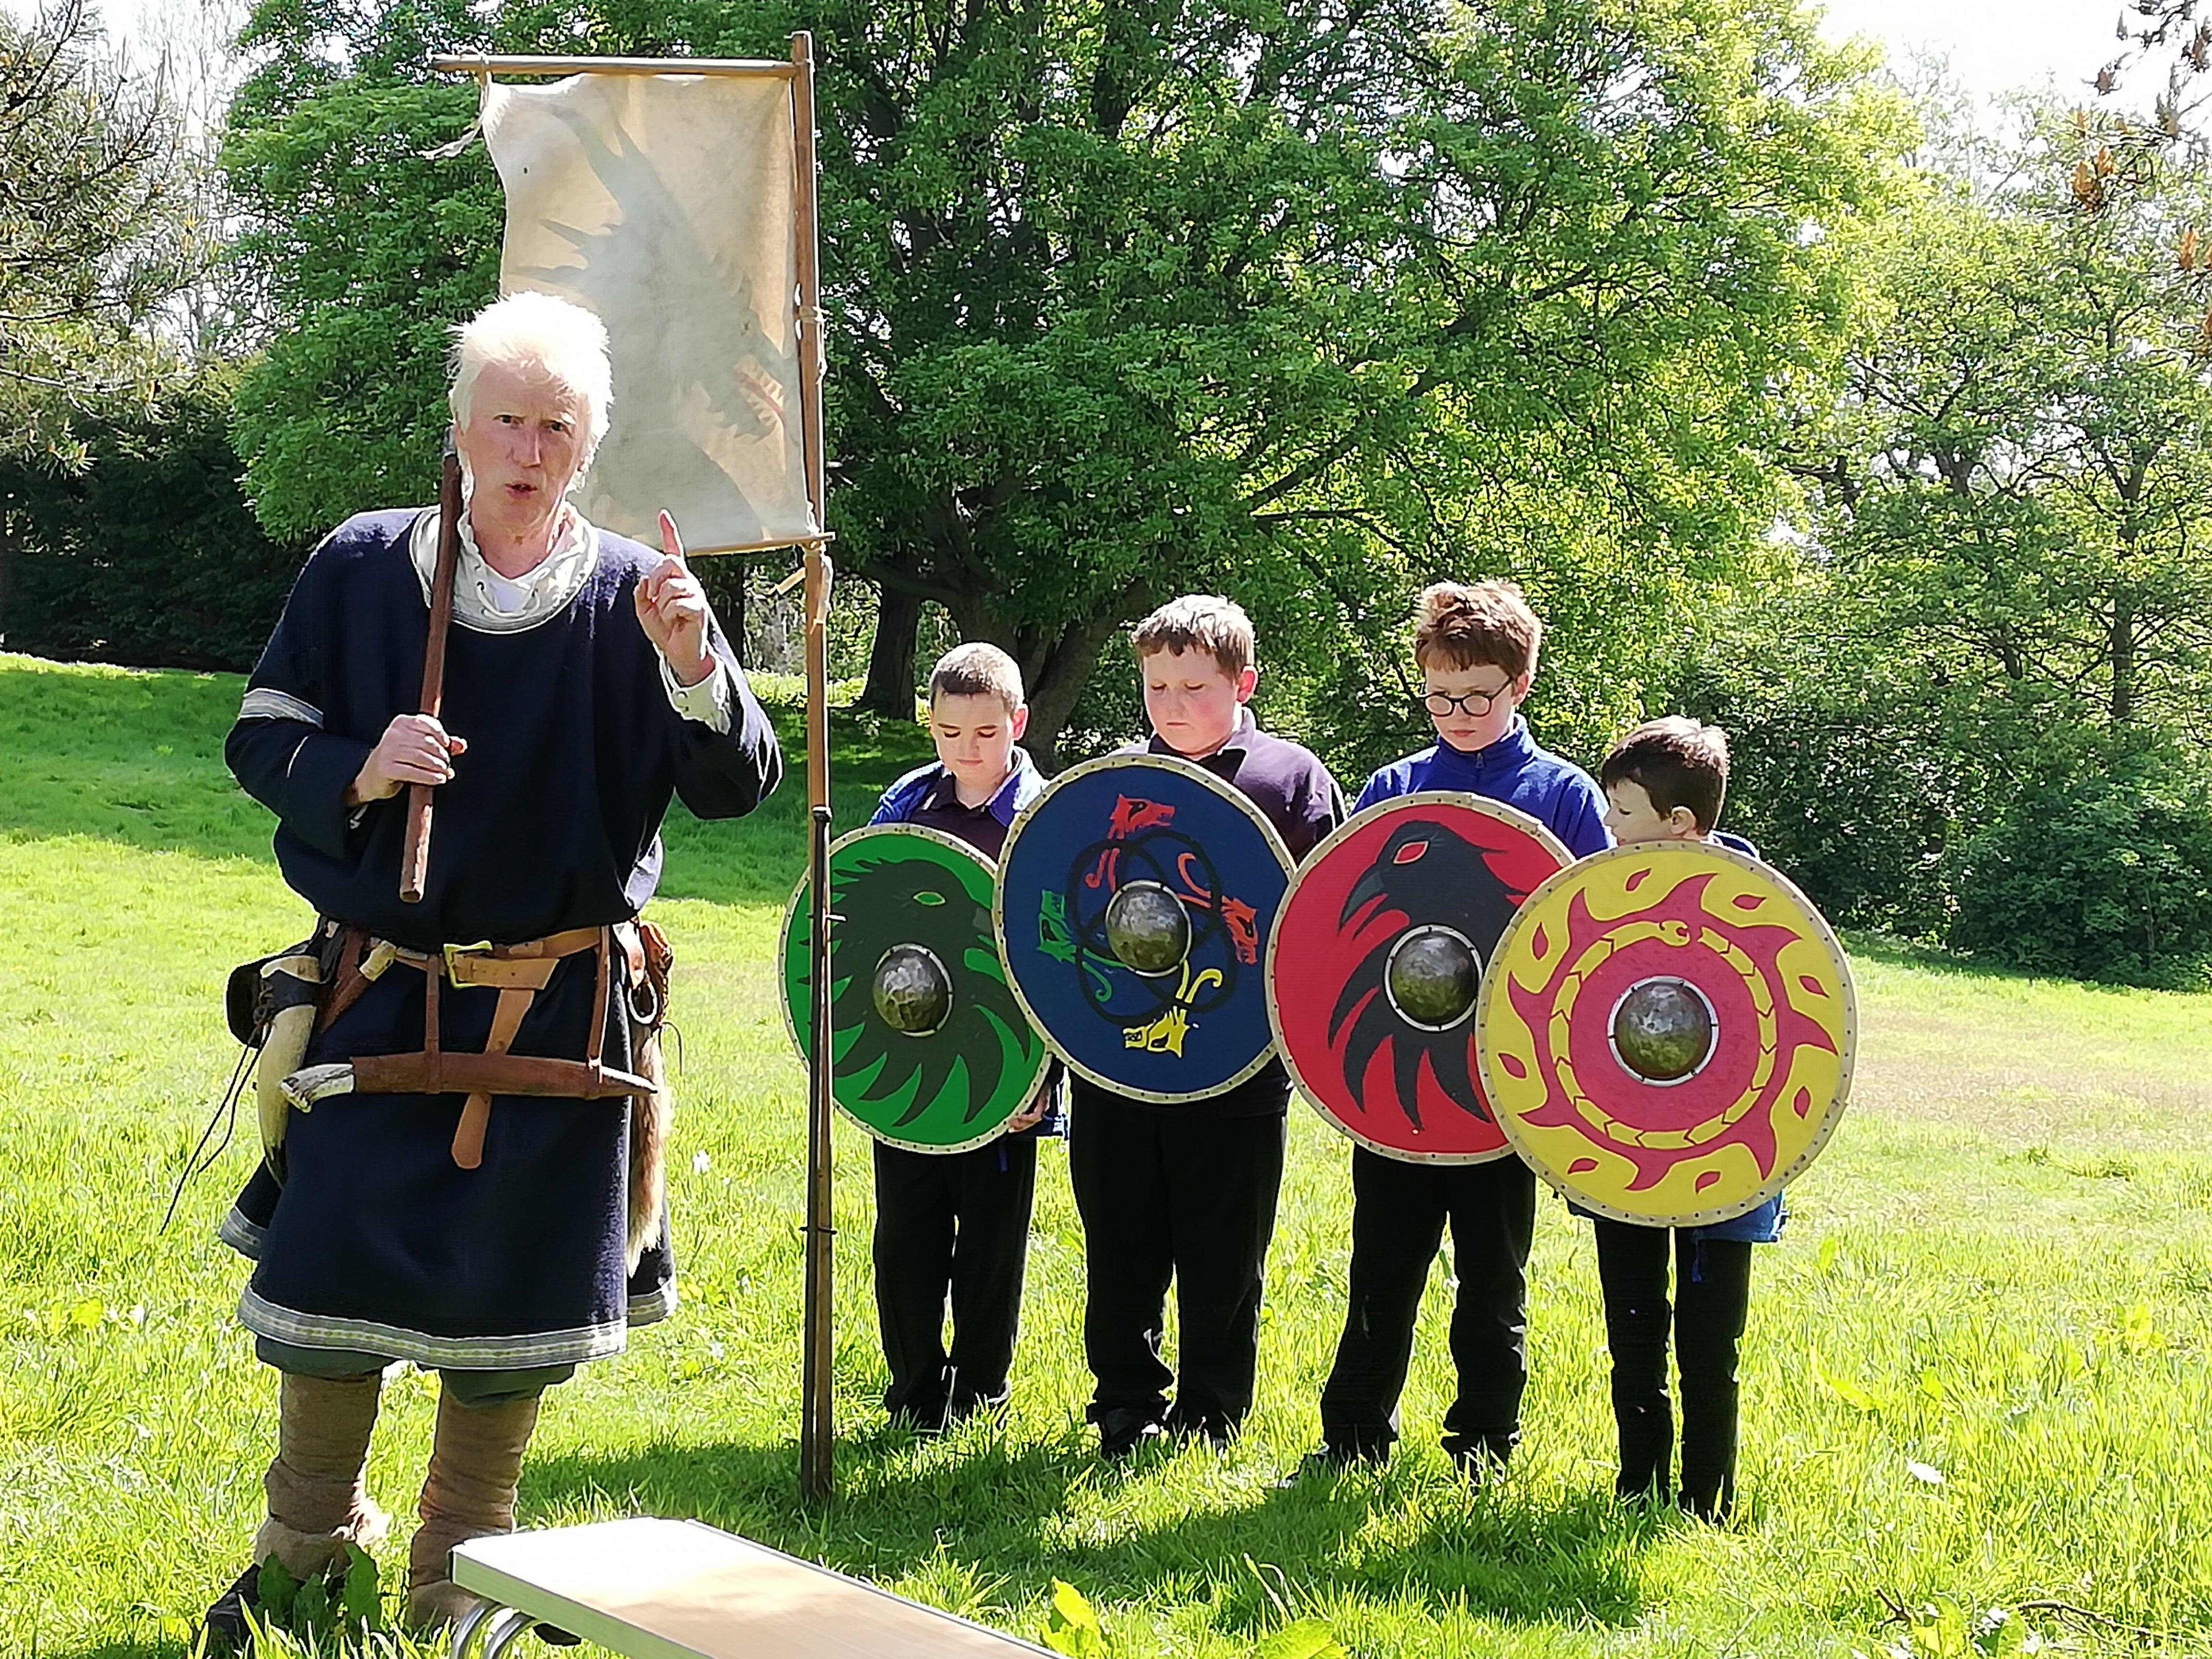 Exploring the world of Vikings at Tatton Park